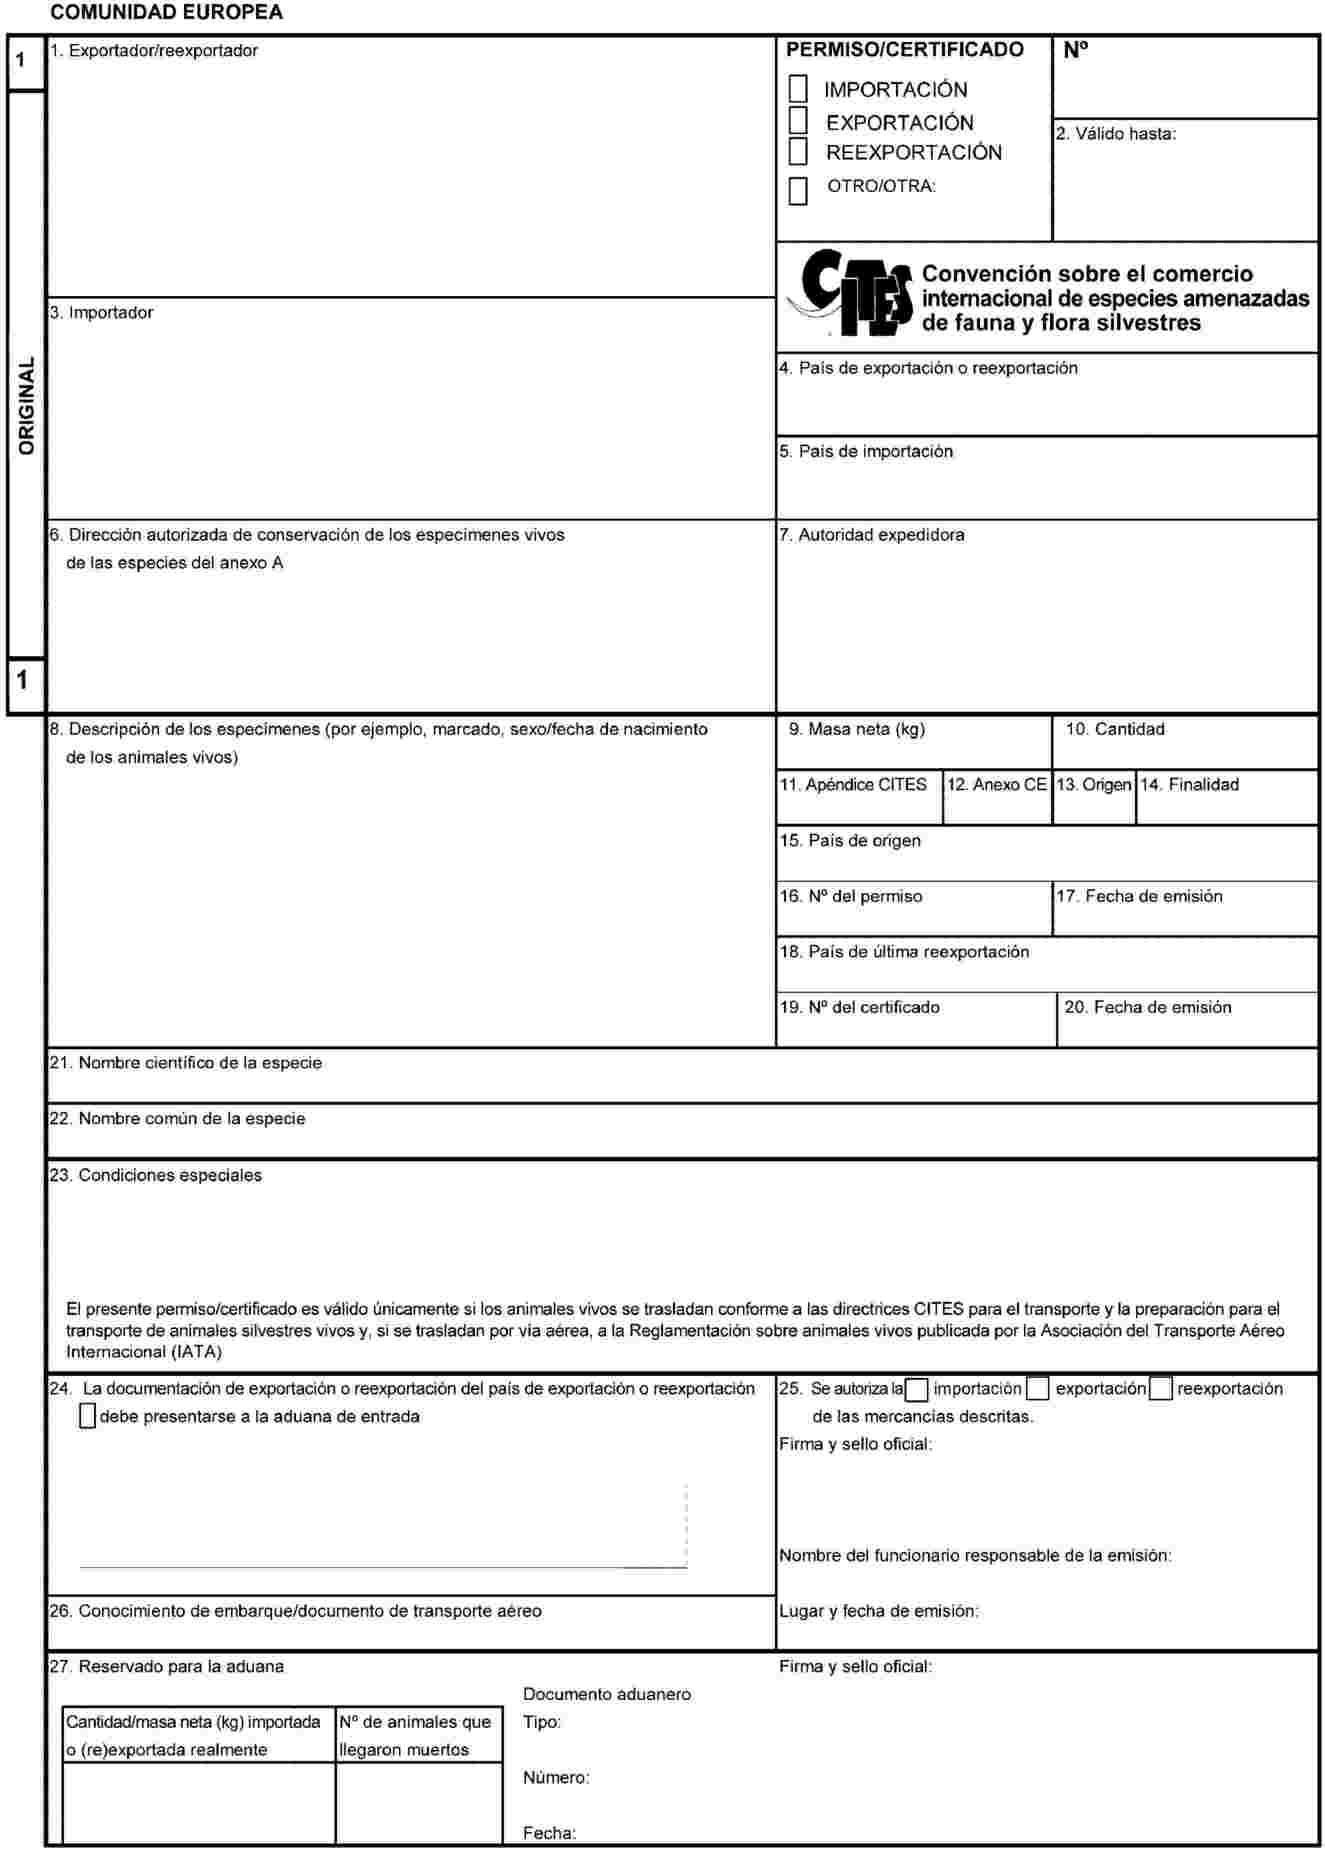 EUR-Lex - 32006R0865 - EN - EUR-Lex